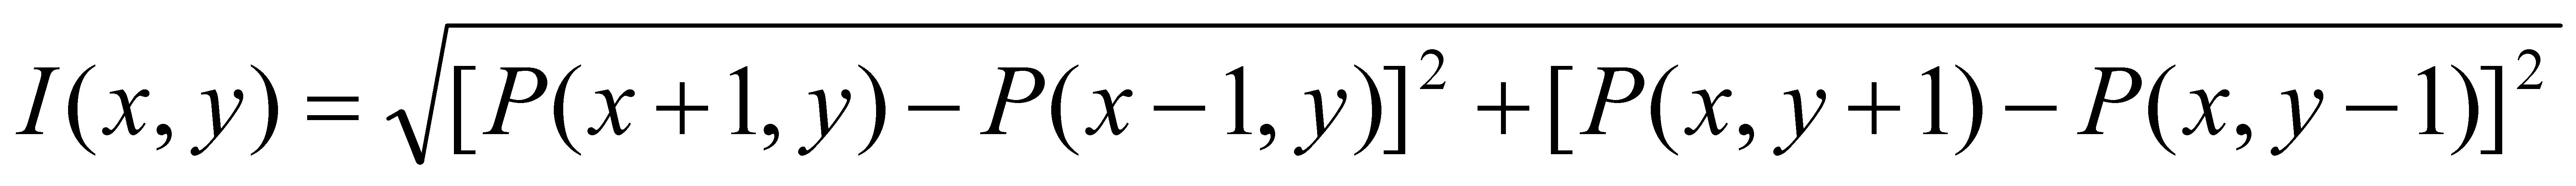 Figure 112010067831763-pat00003